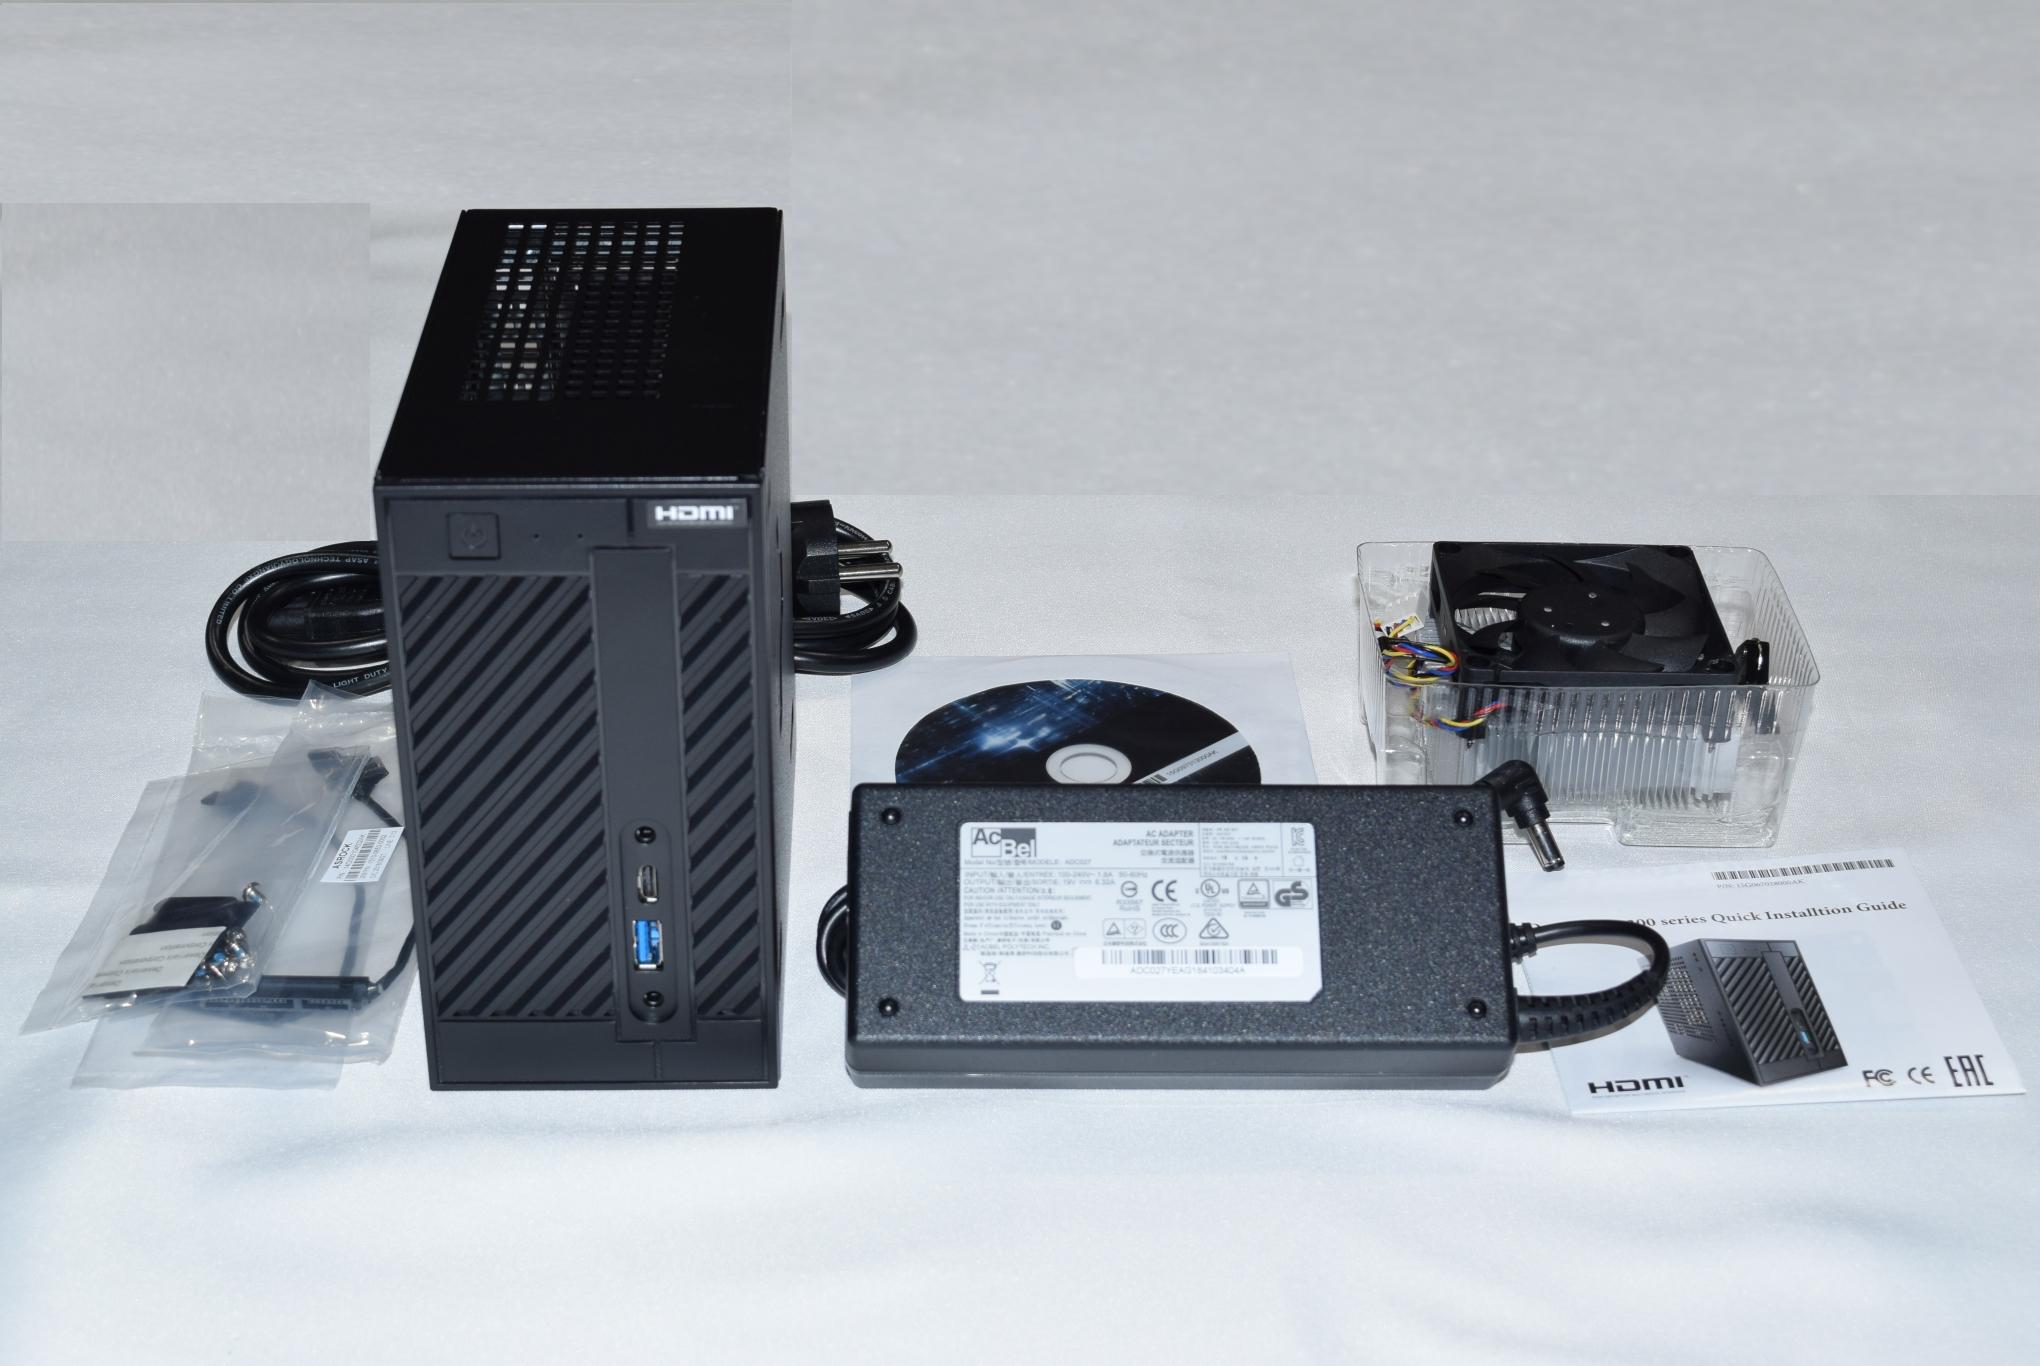 The ASRock DeskMini A300 Review: An Affordable DIY AMD Ryzen